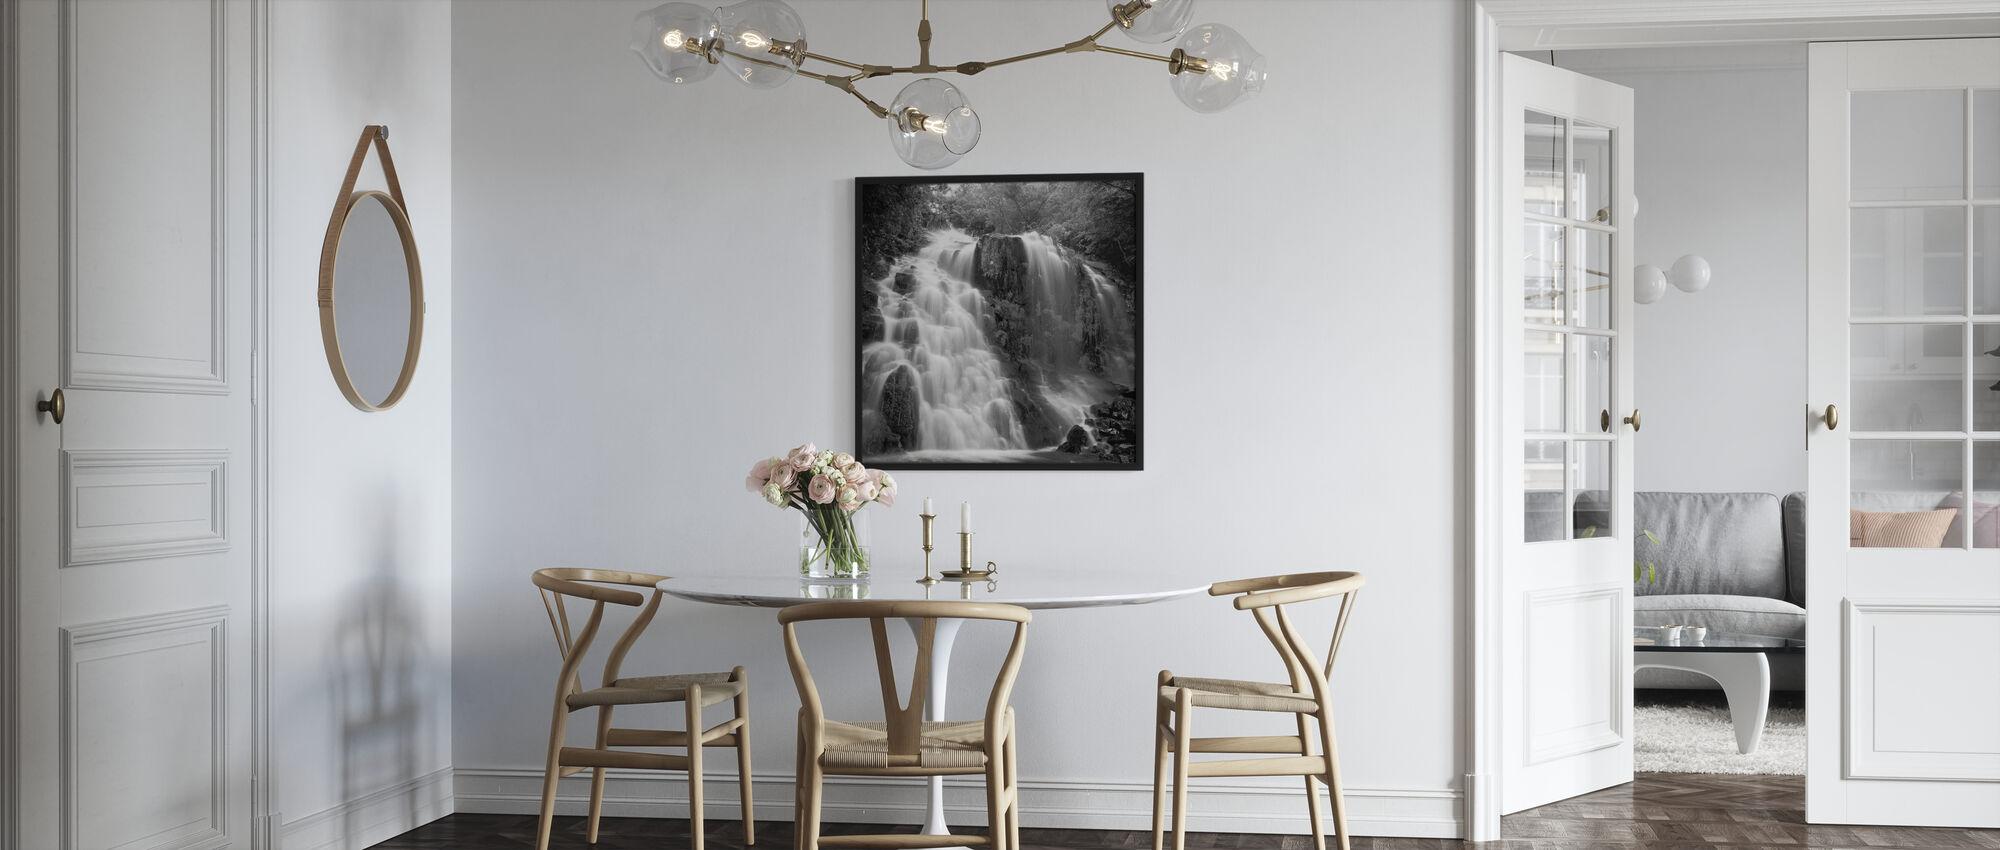 Nature Scenery - b/w - Poster - Kitchen